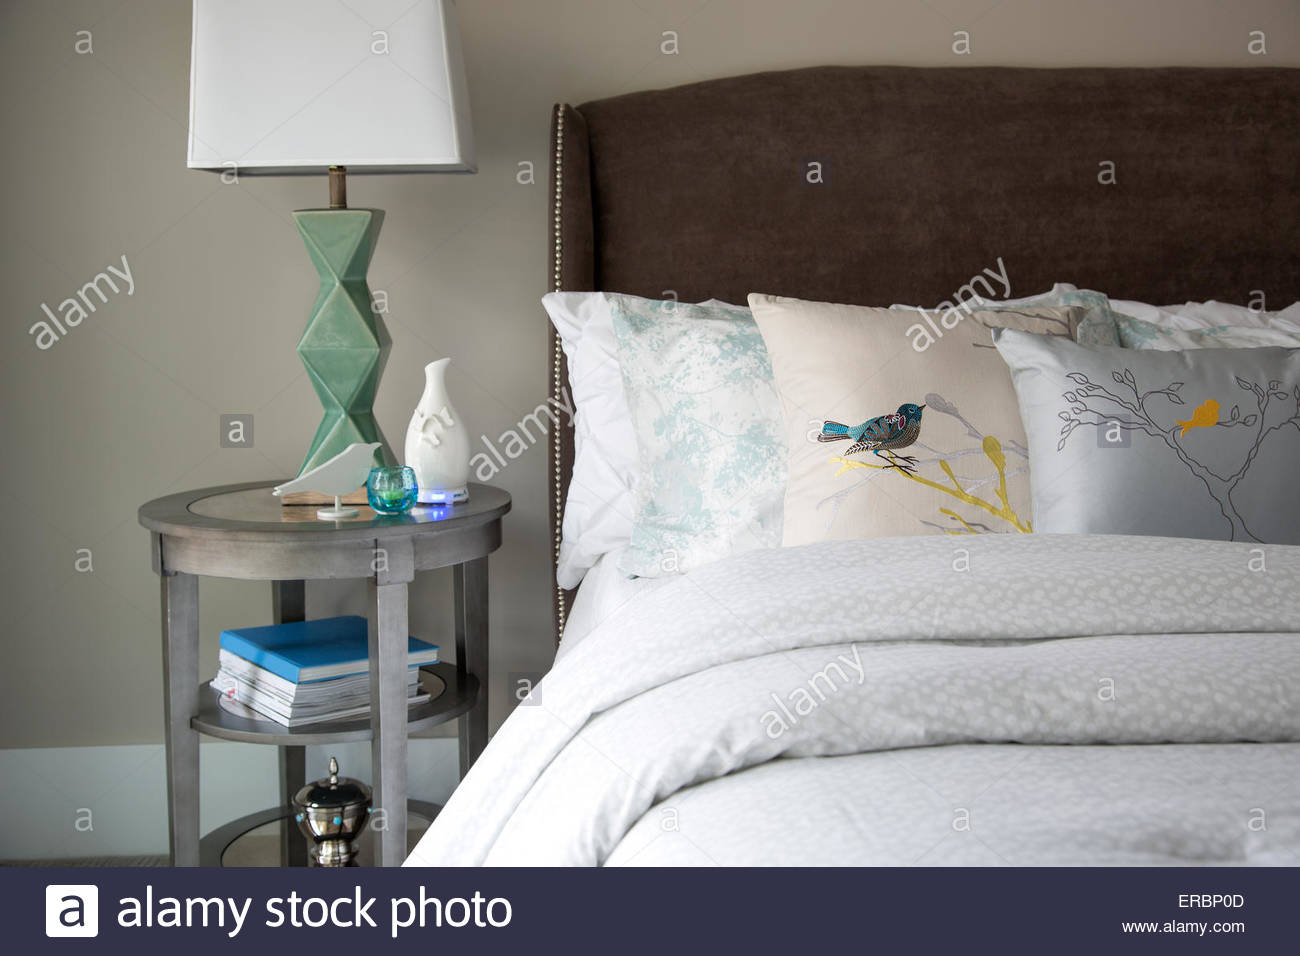 Bird pillows on elegant bed - Stock Image